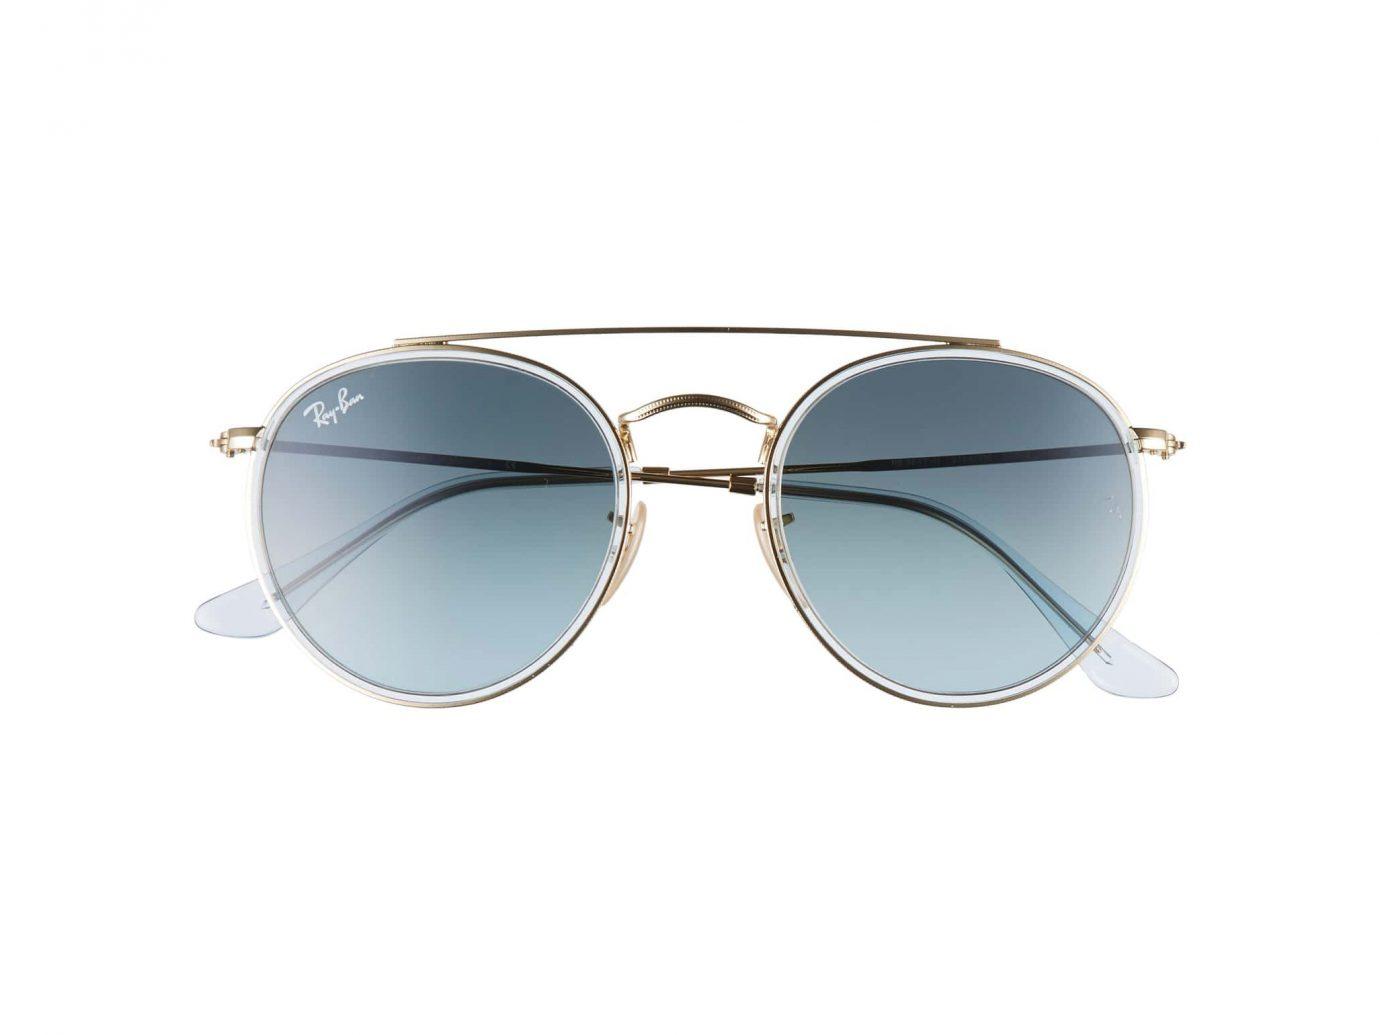 51mm Aviator Gradient Lens Sunglasses